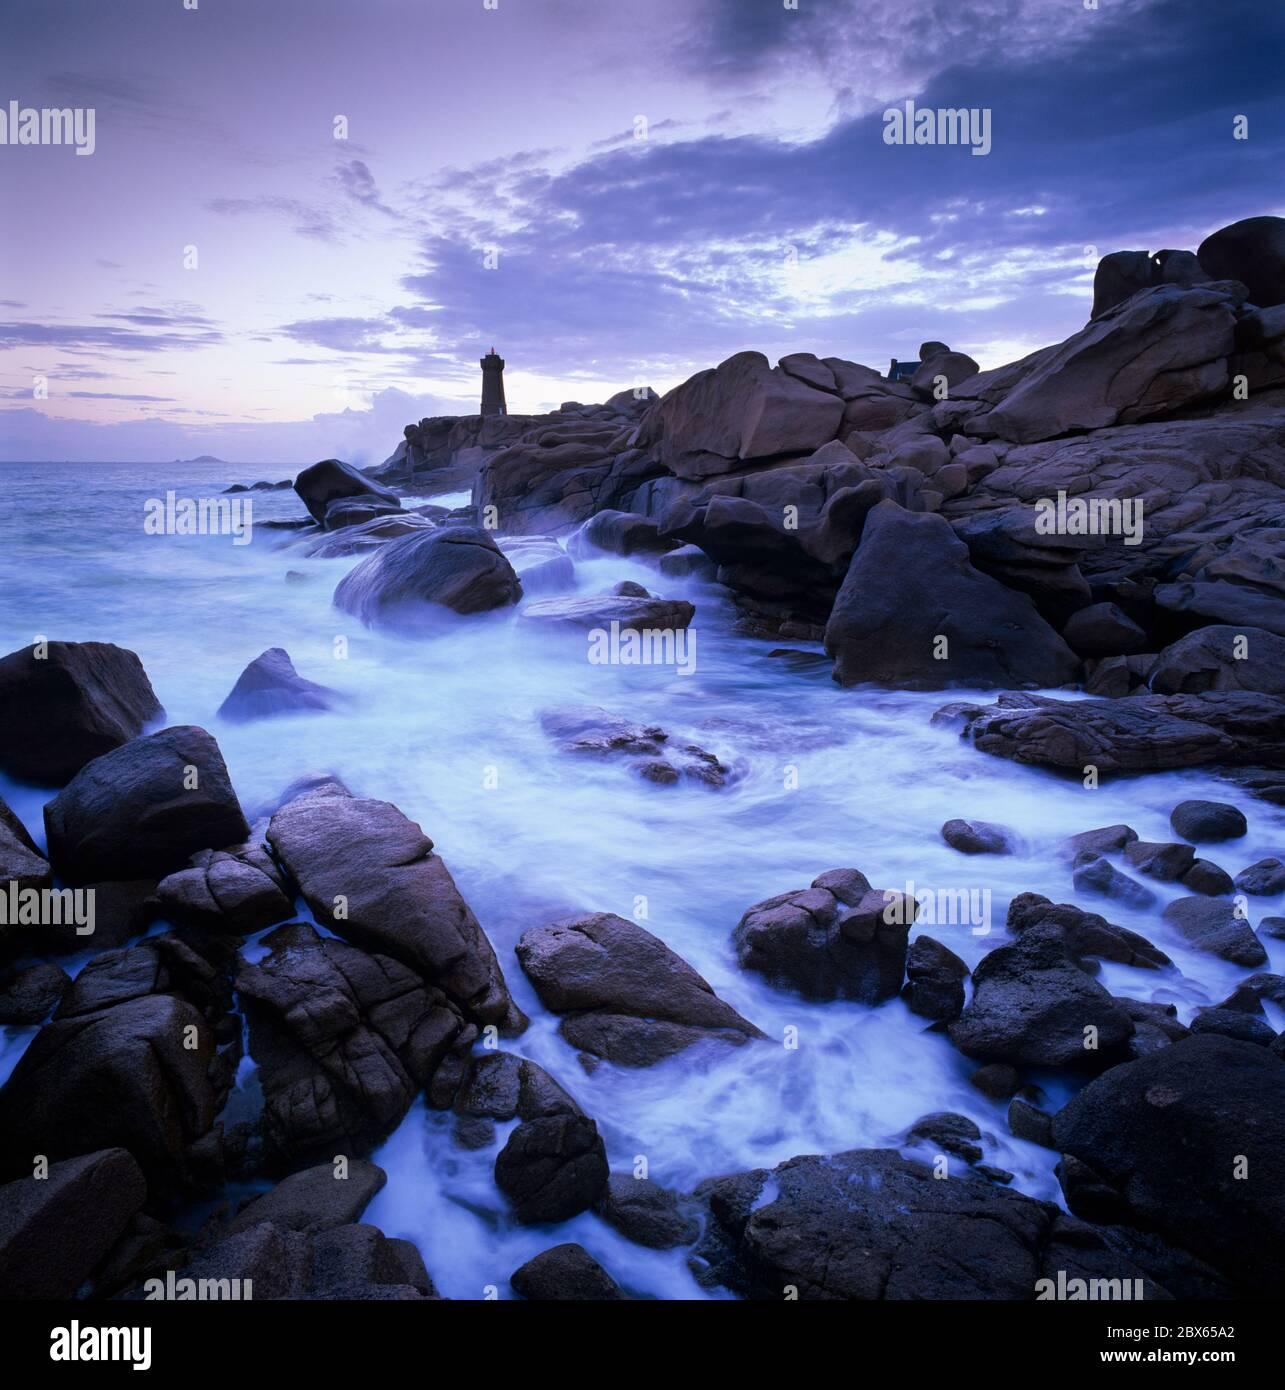 Faro sobre el mar tormentoso en la Costa de granito Rosa, Ploumanac'h, Cotes d'Armor, Bretaña, Francia Foto de stock